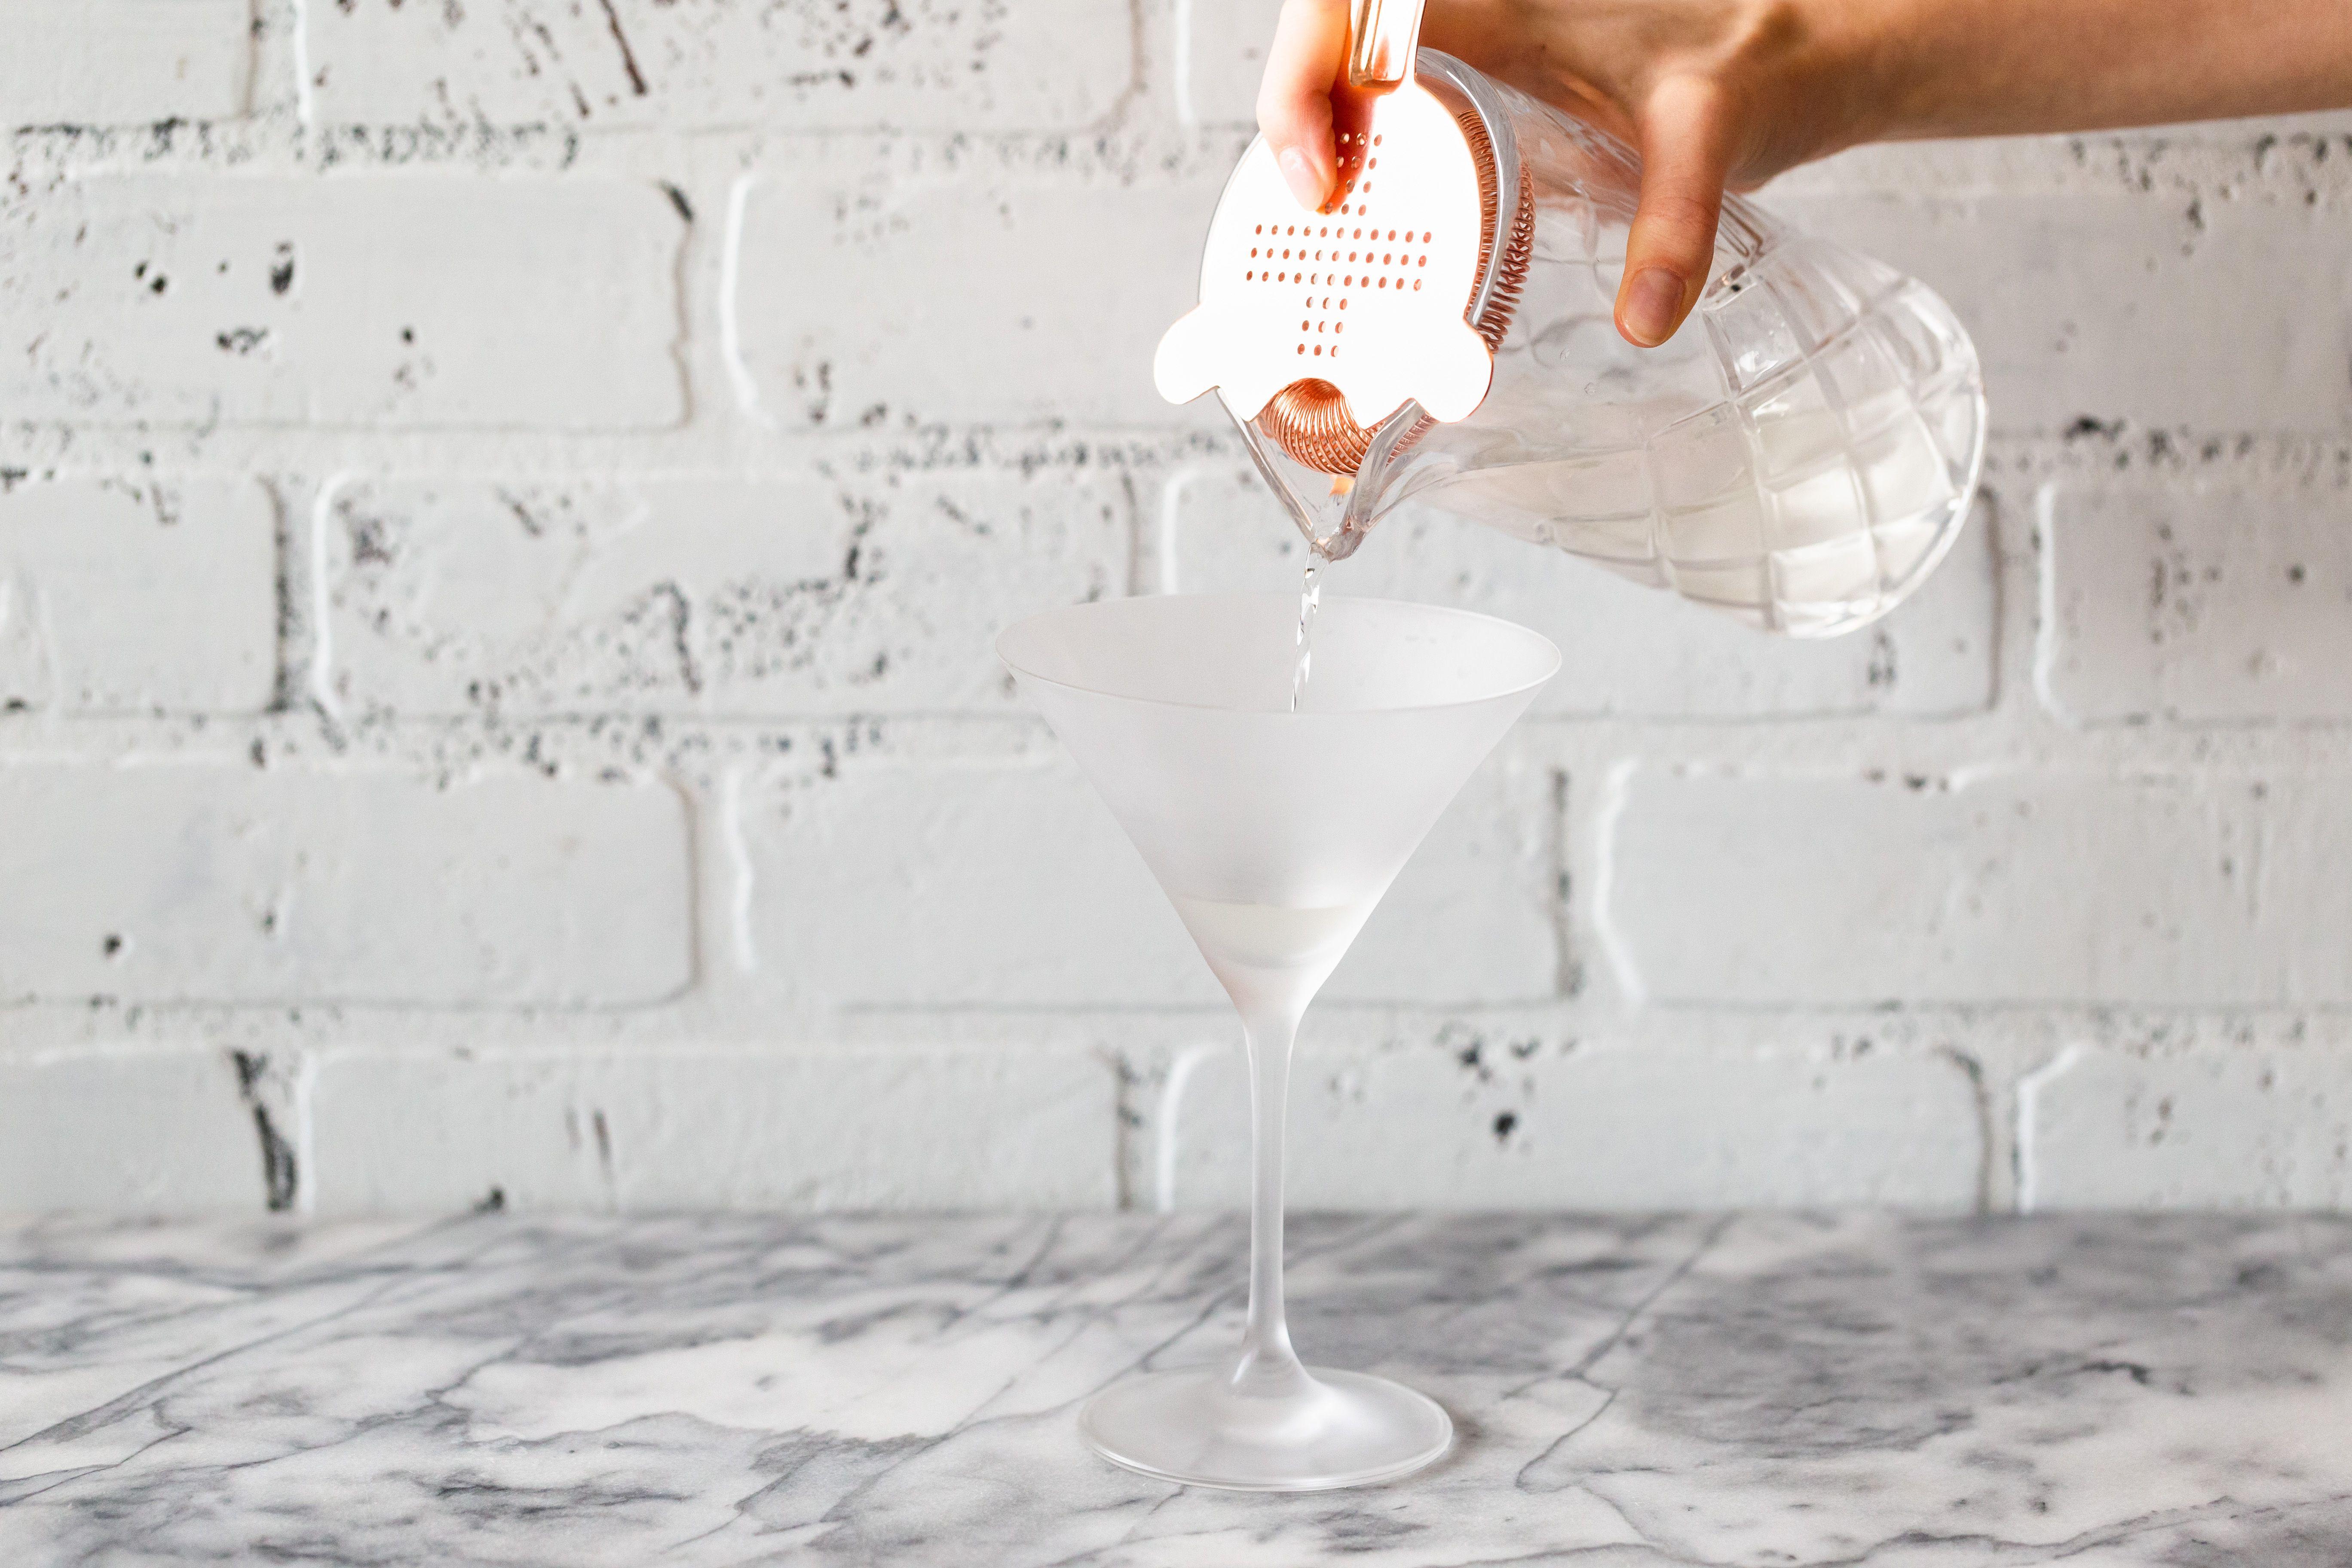 Straining the Gibson gin martini